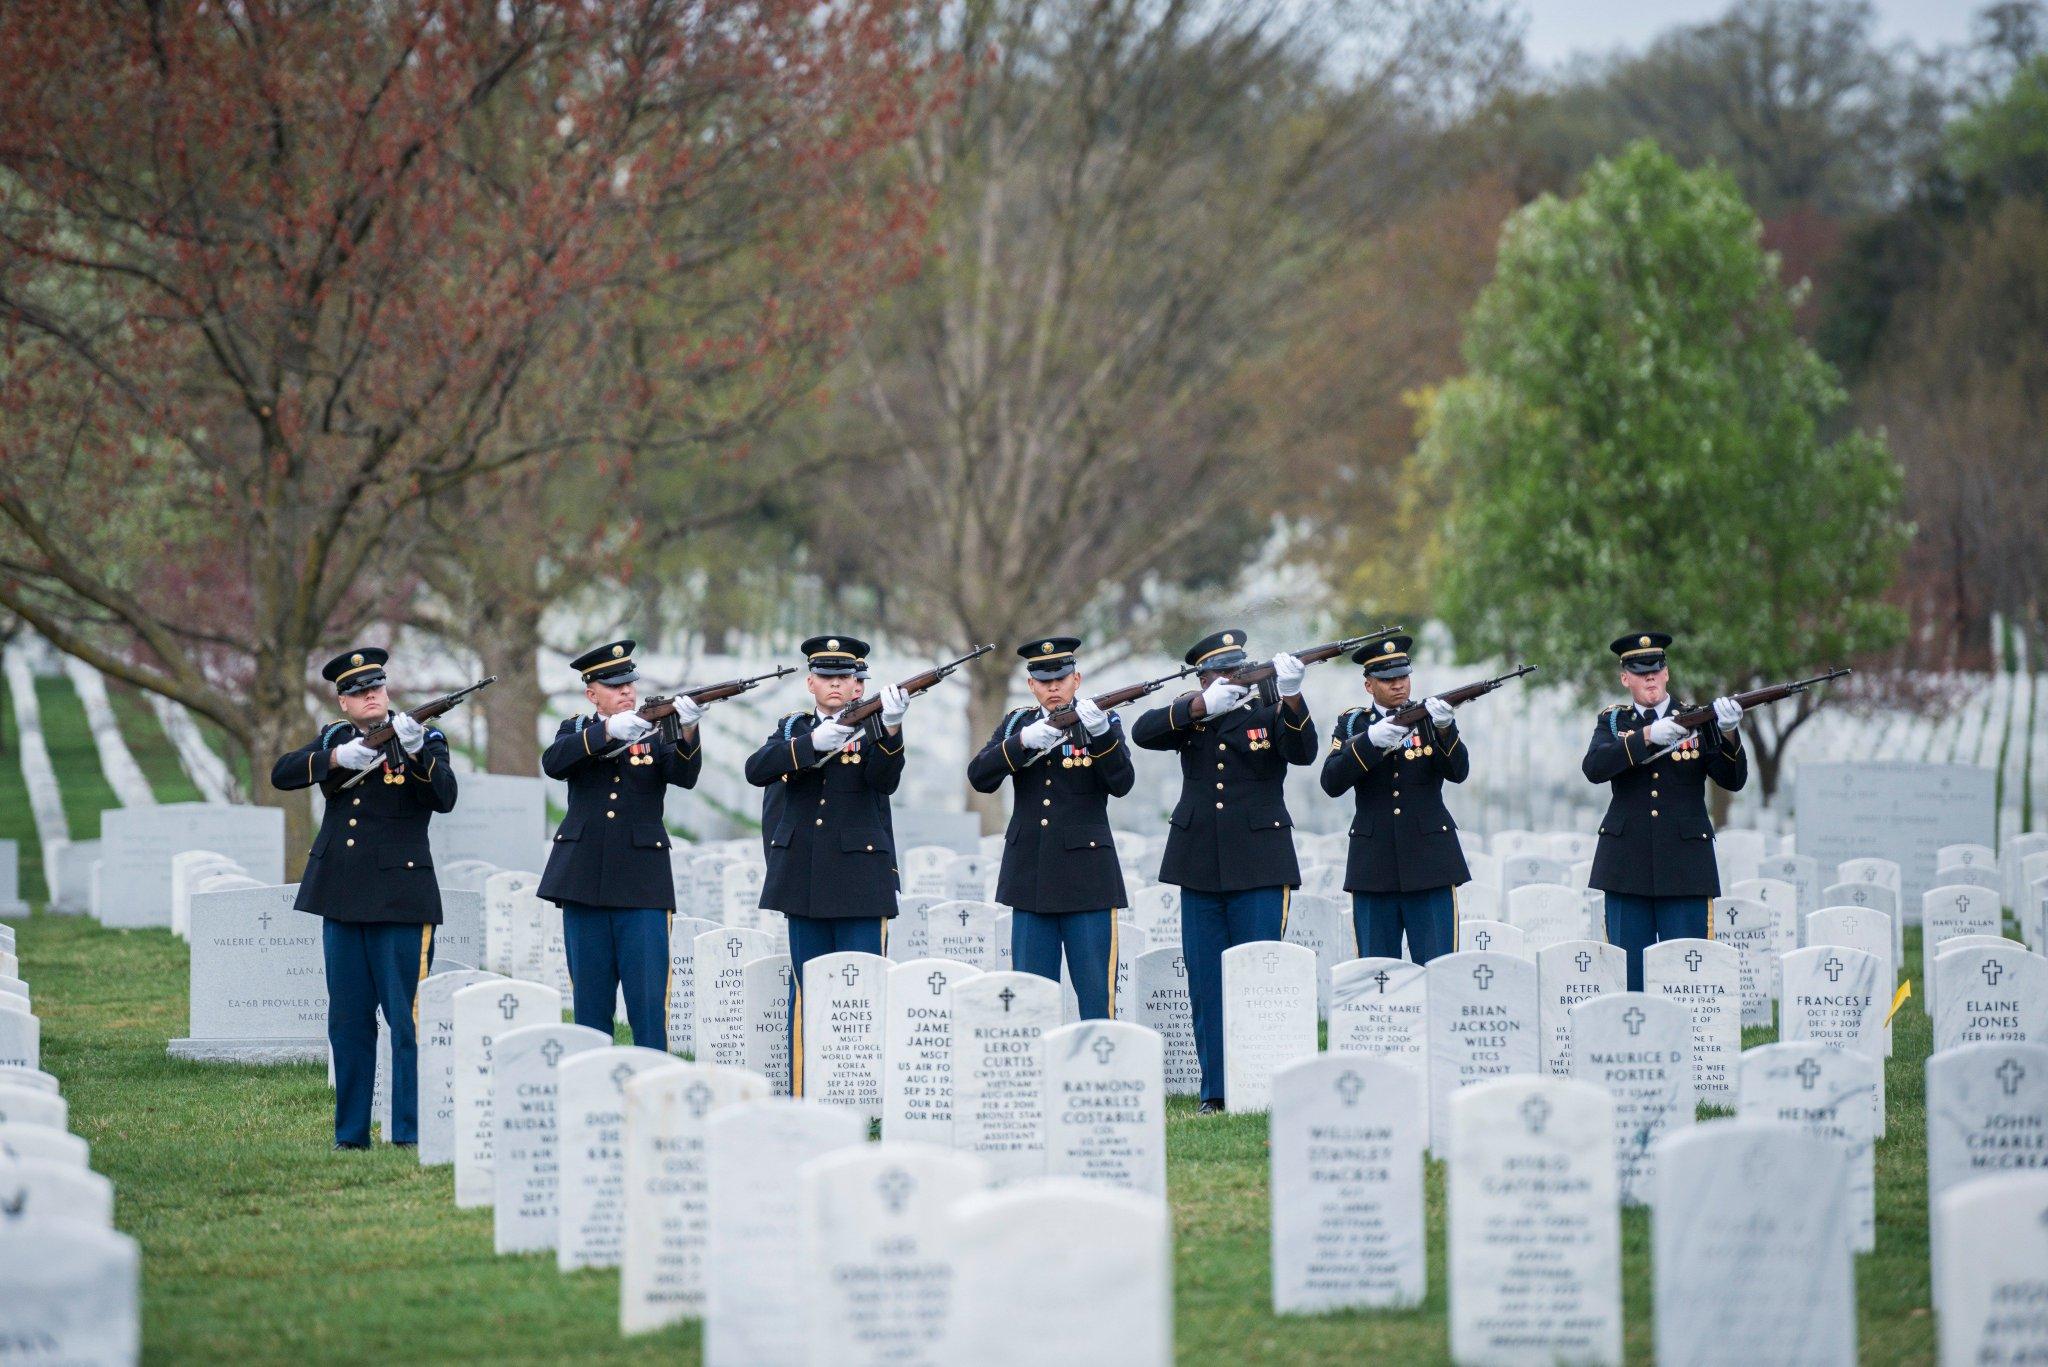 Arlington National Cemetery on Twitter: